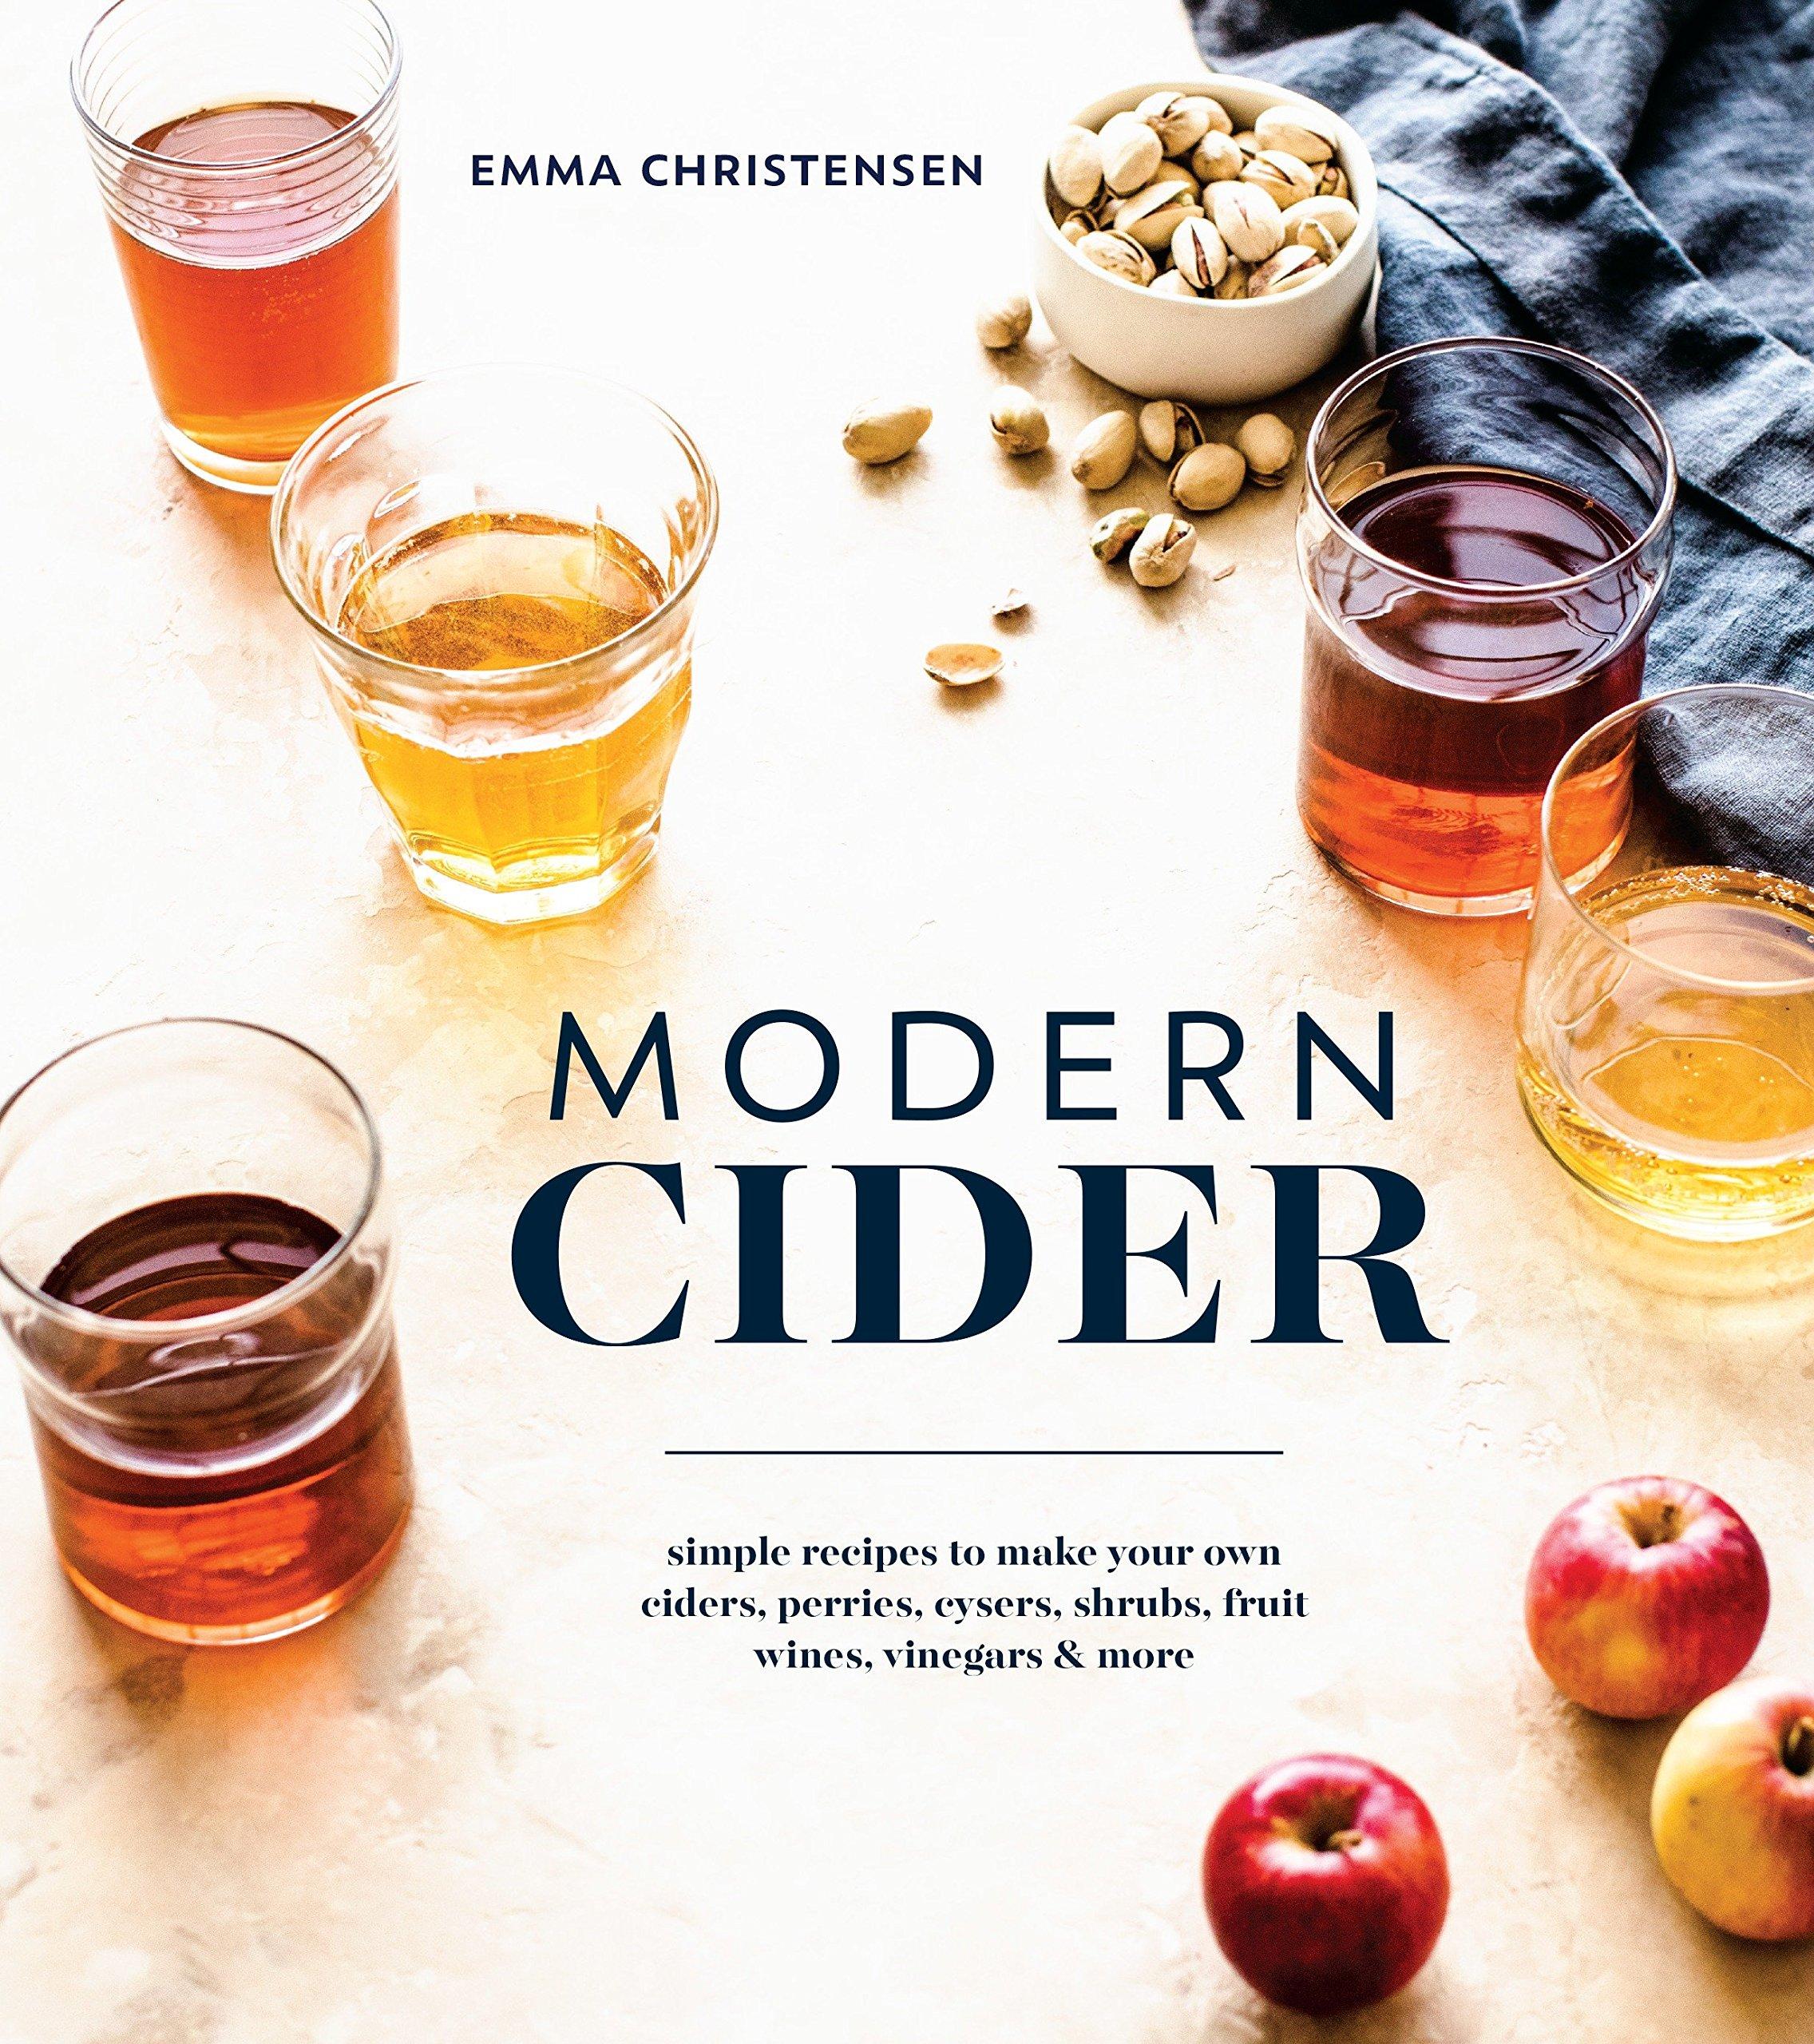 How to make cider Making cider at home: recipes 66